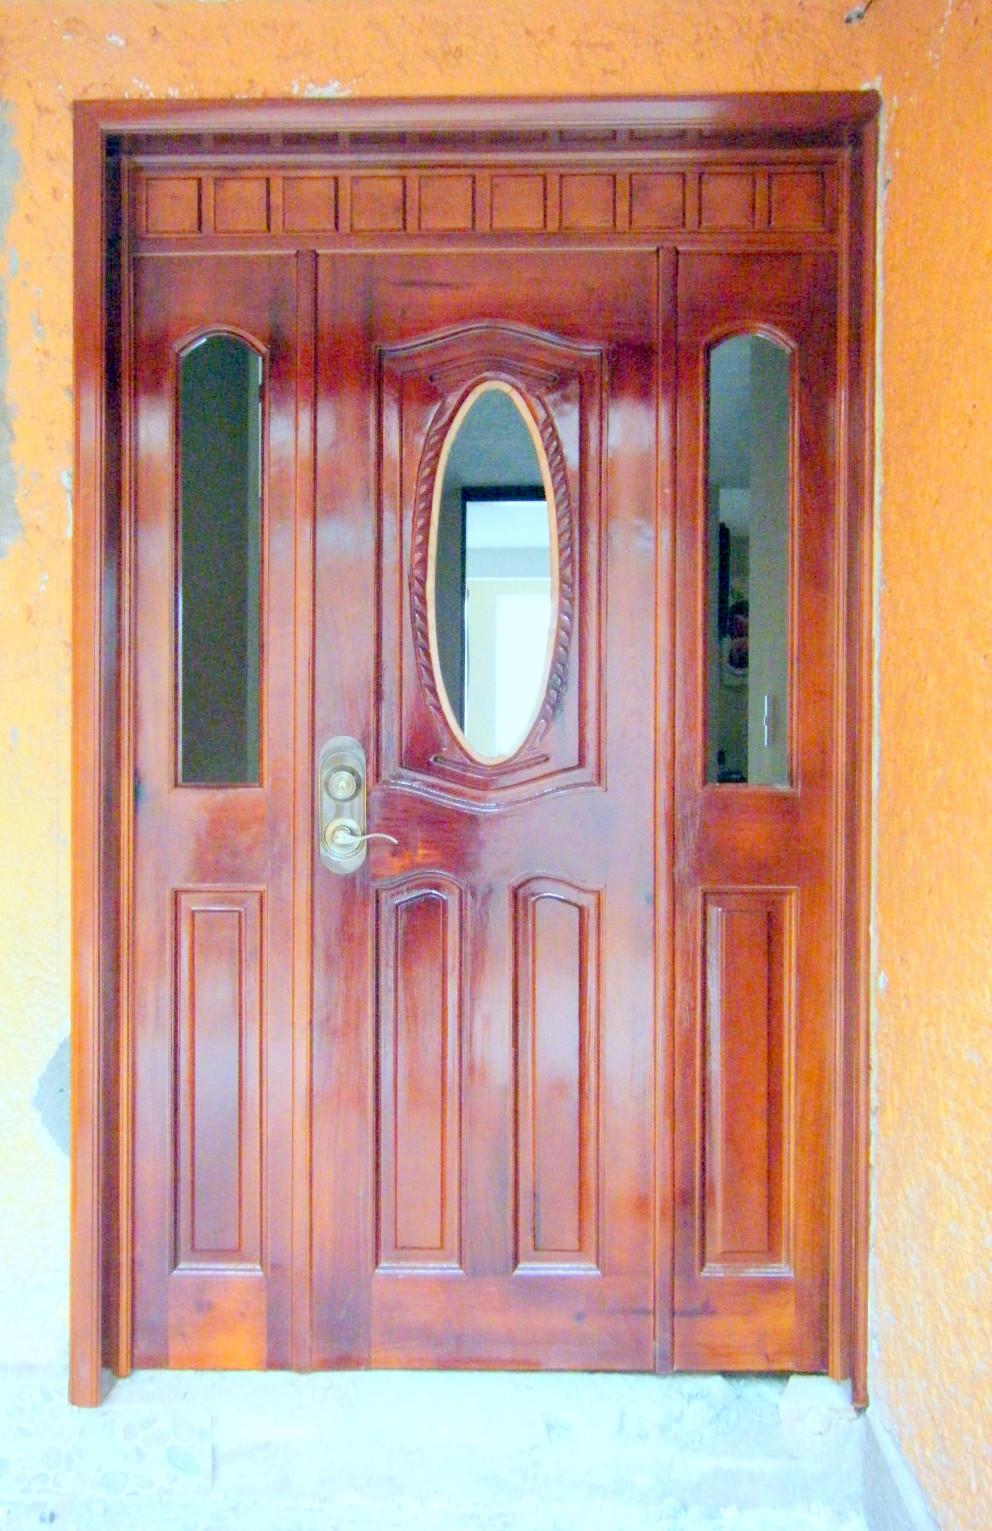 Puntos basicos carpinteria puerta de acceso principal for Puertas de acceso principal